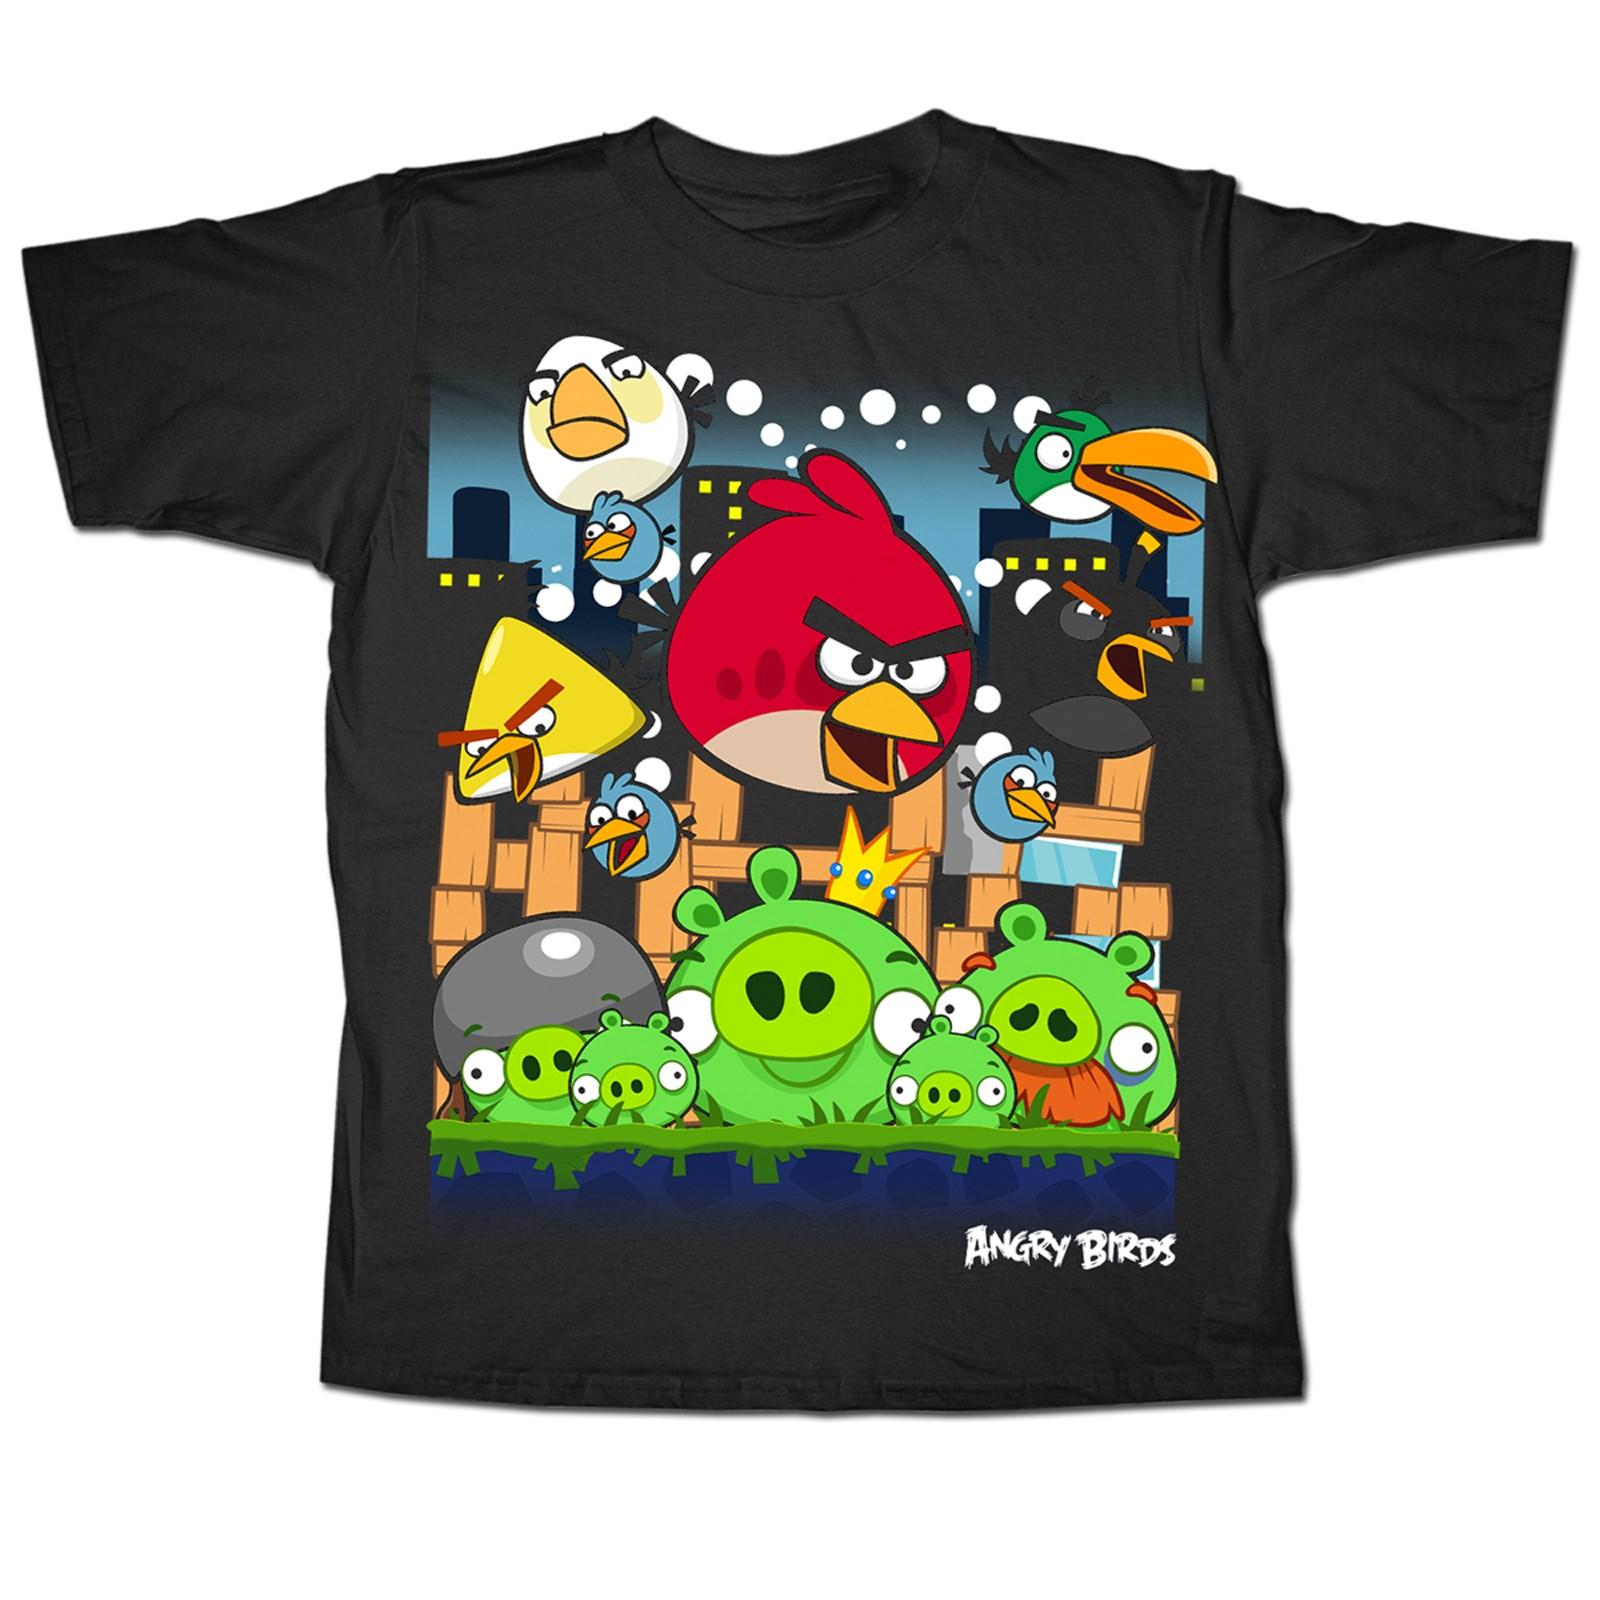 Black Angry Birds T-Shirt